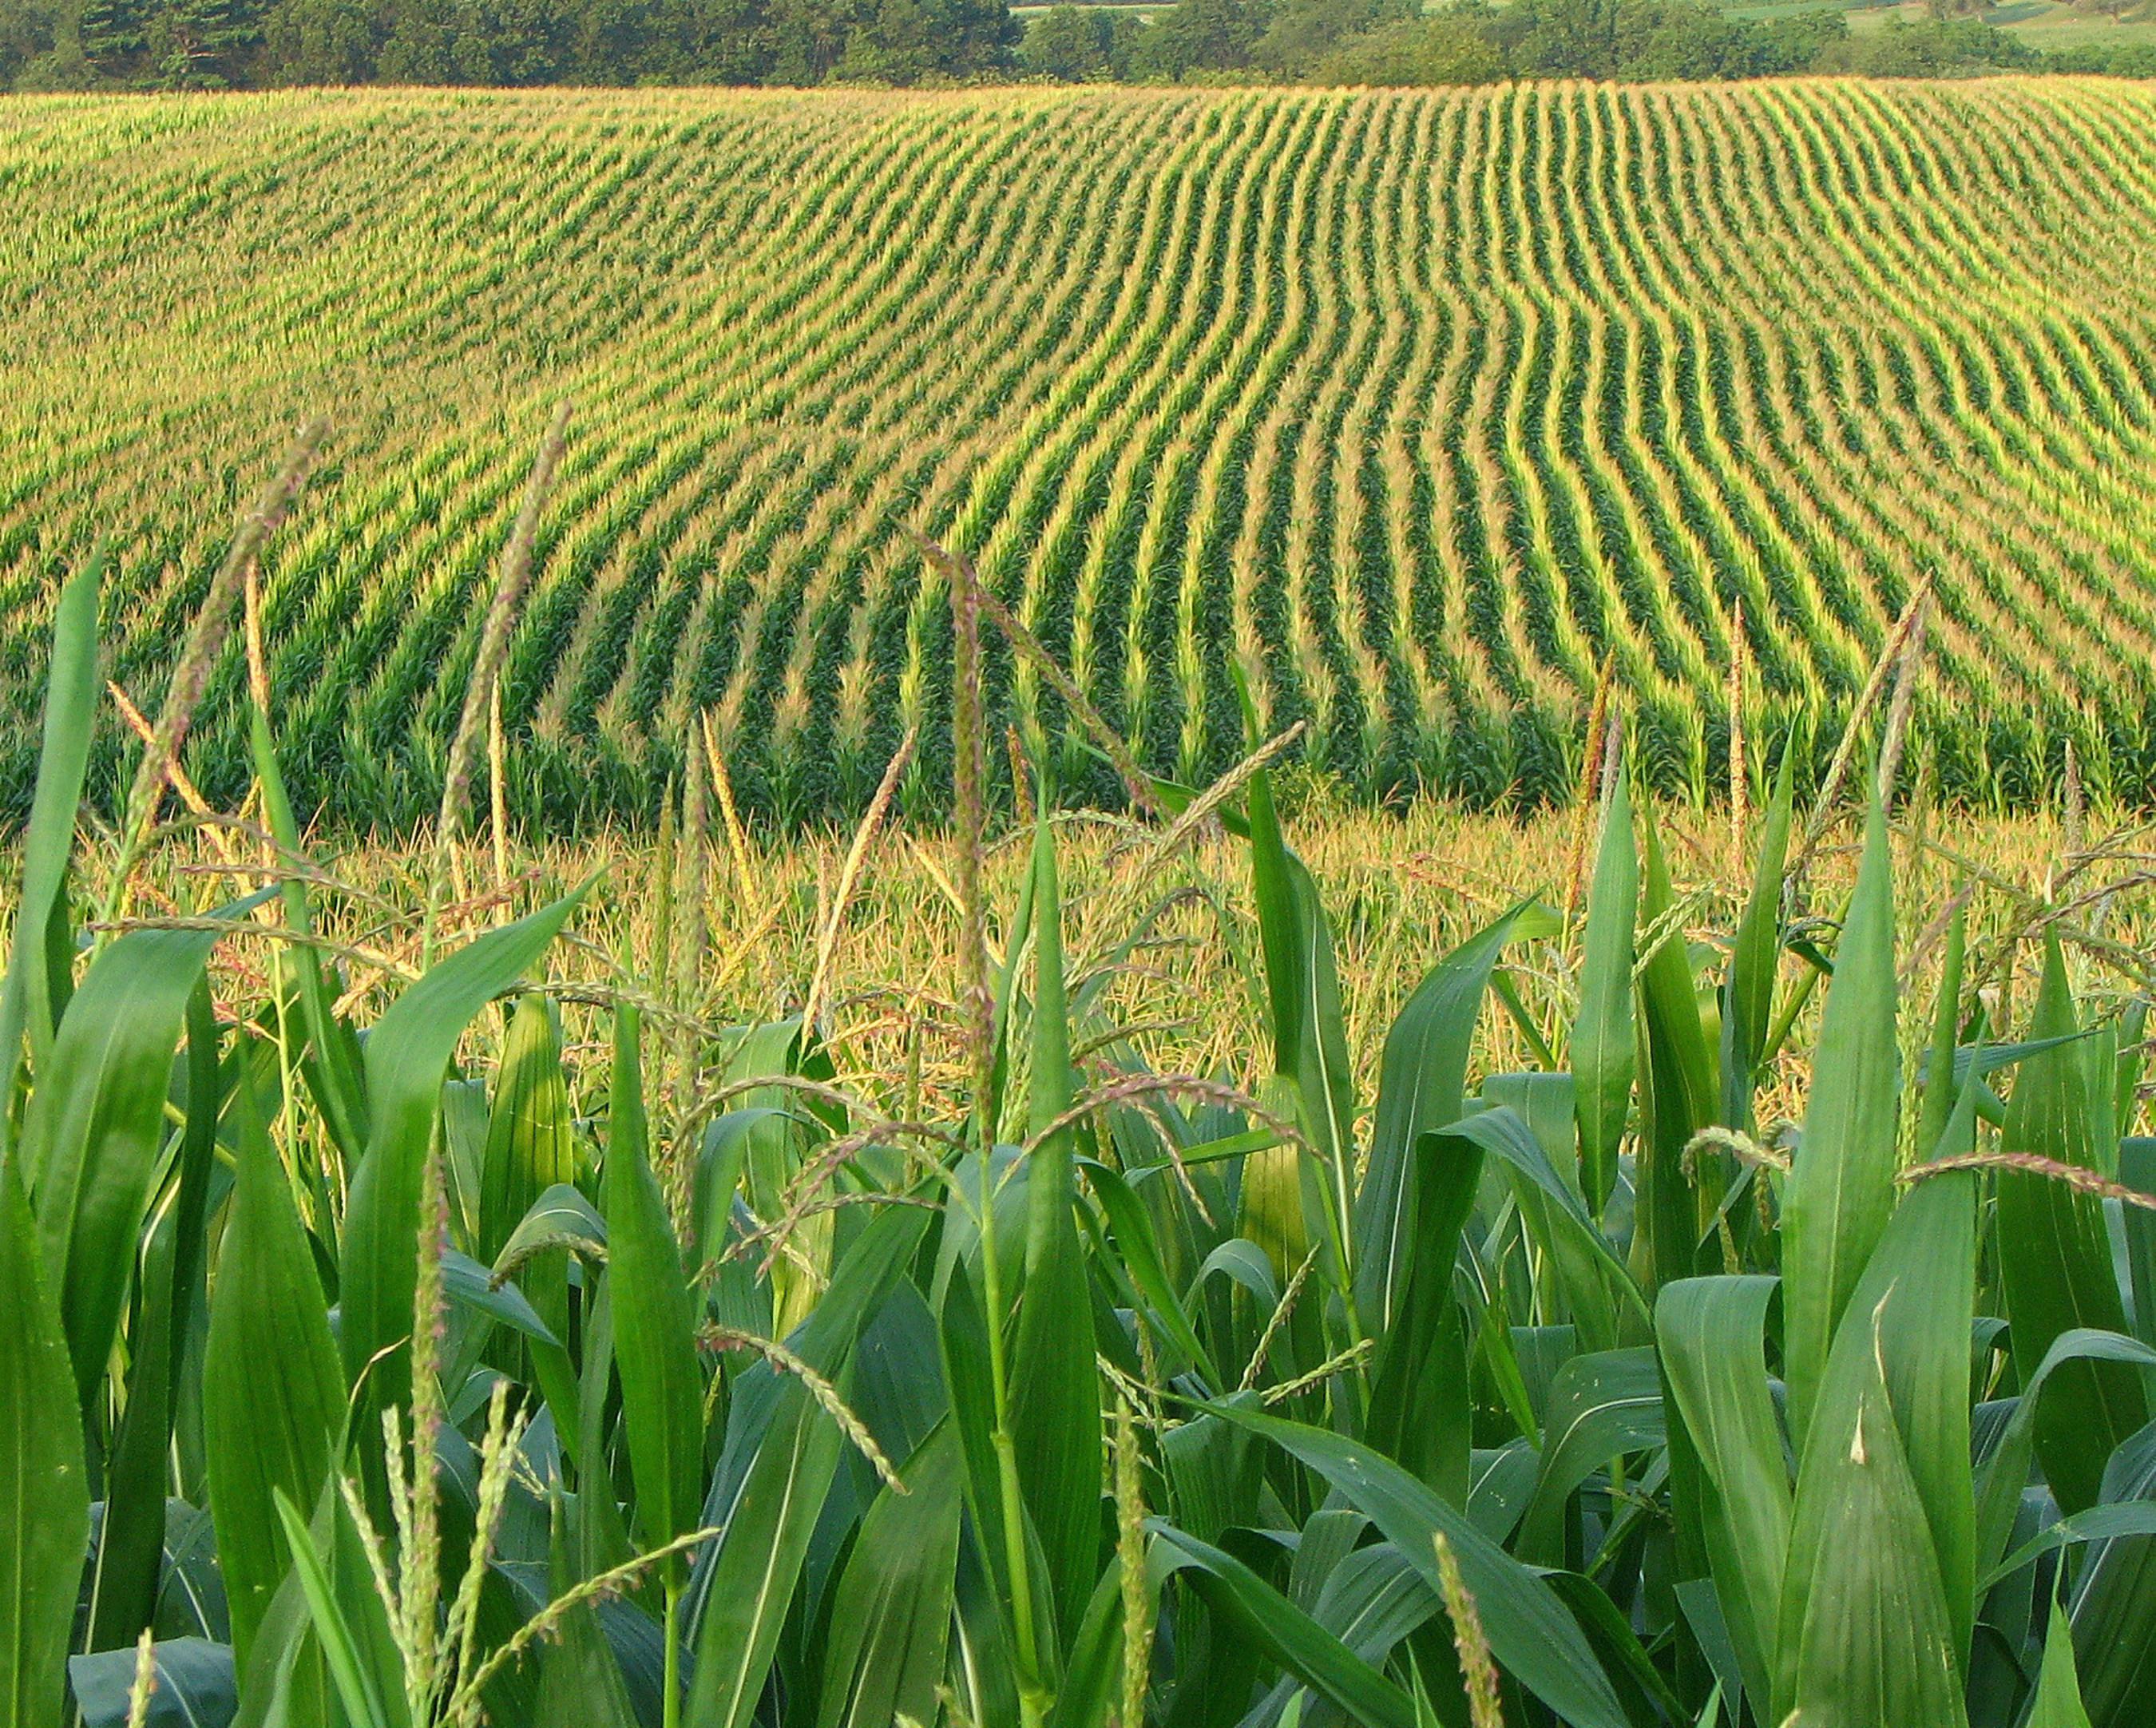 Mikal Watts leads GMO Corn Lawsuit Against Syngenta